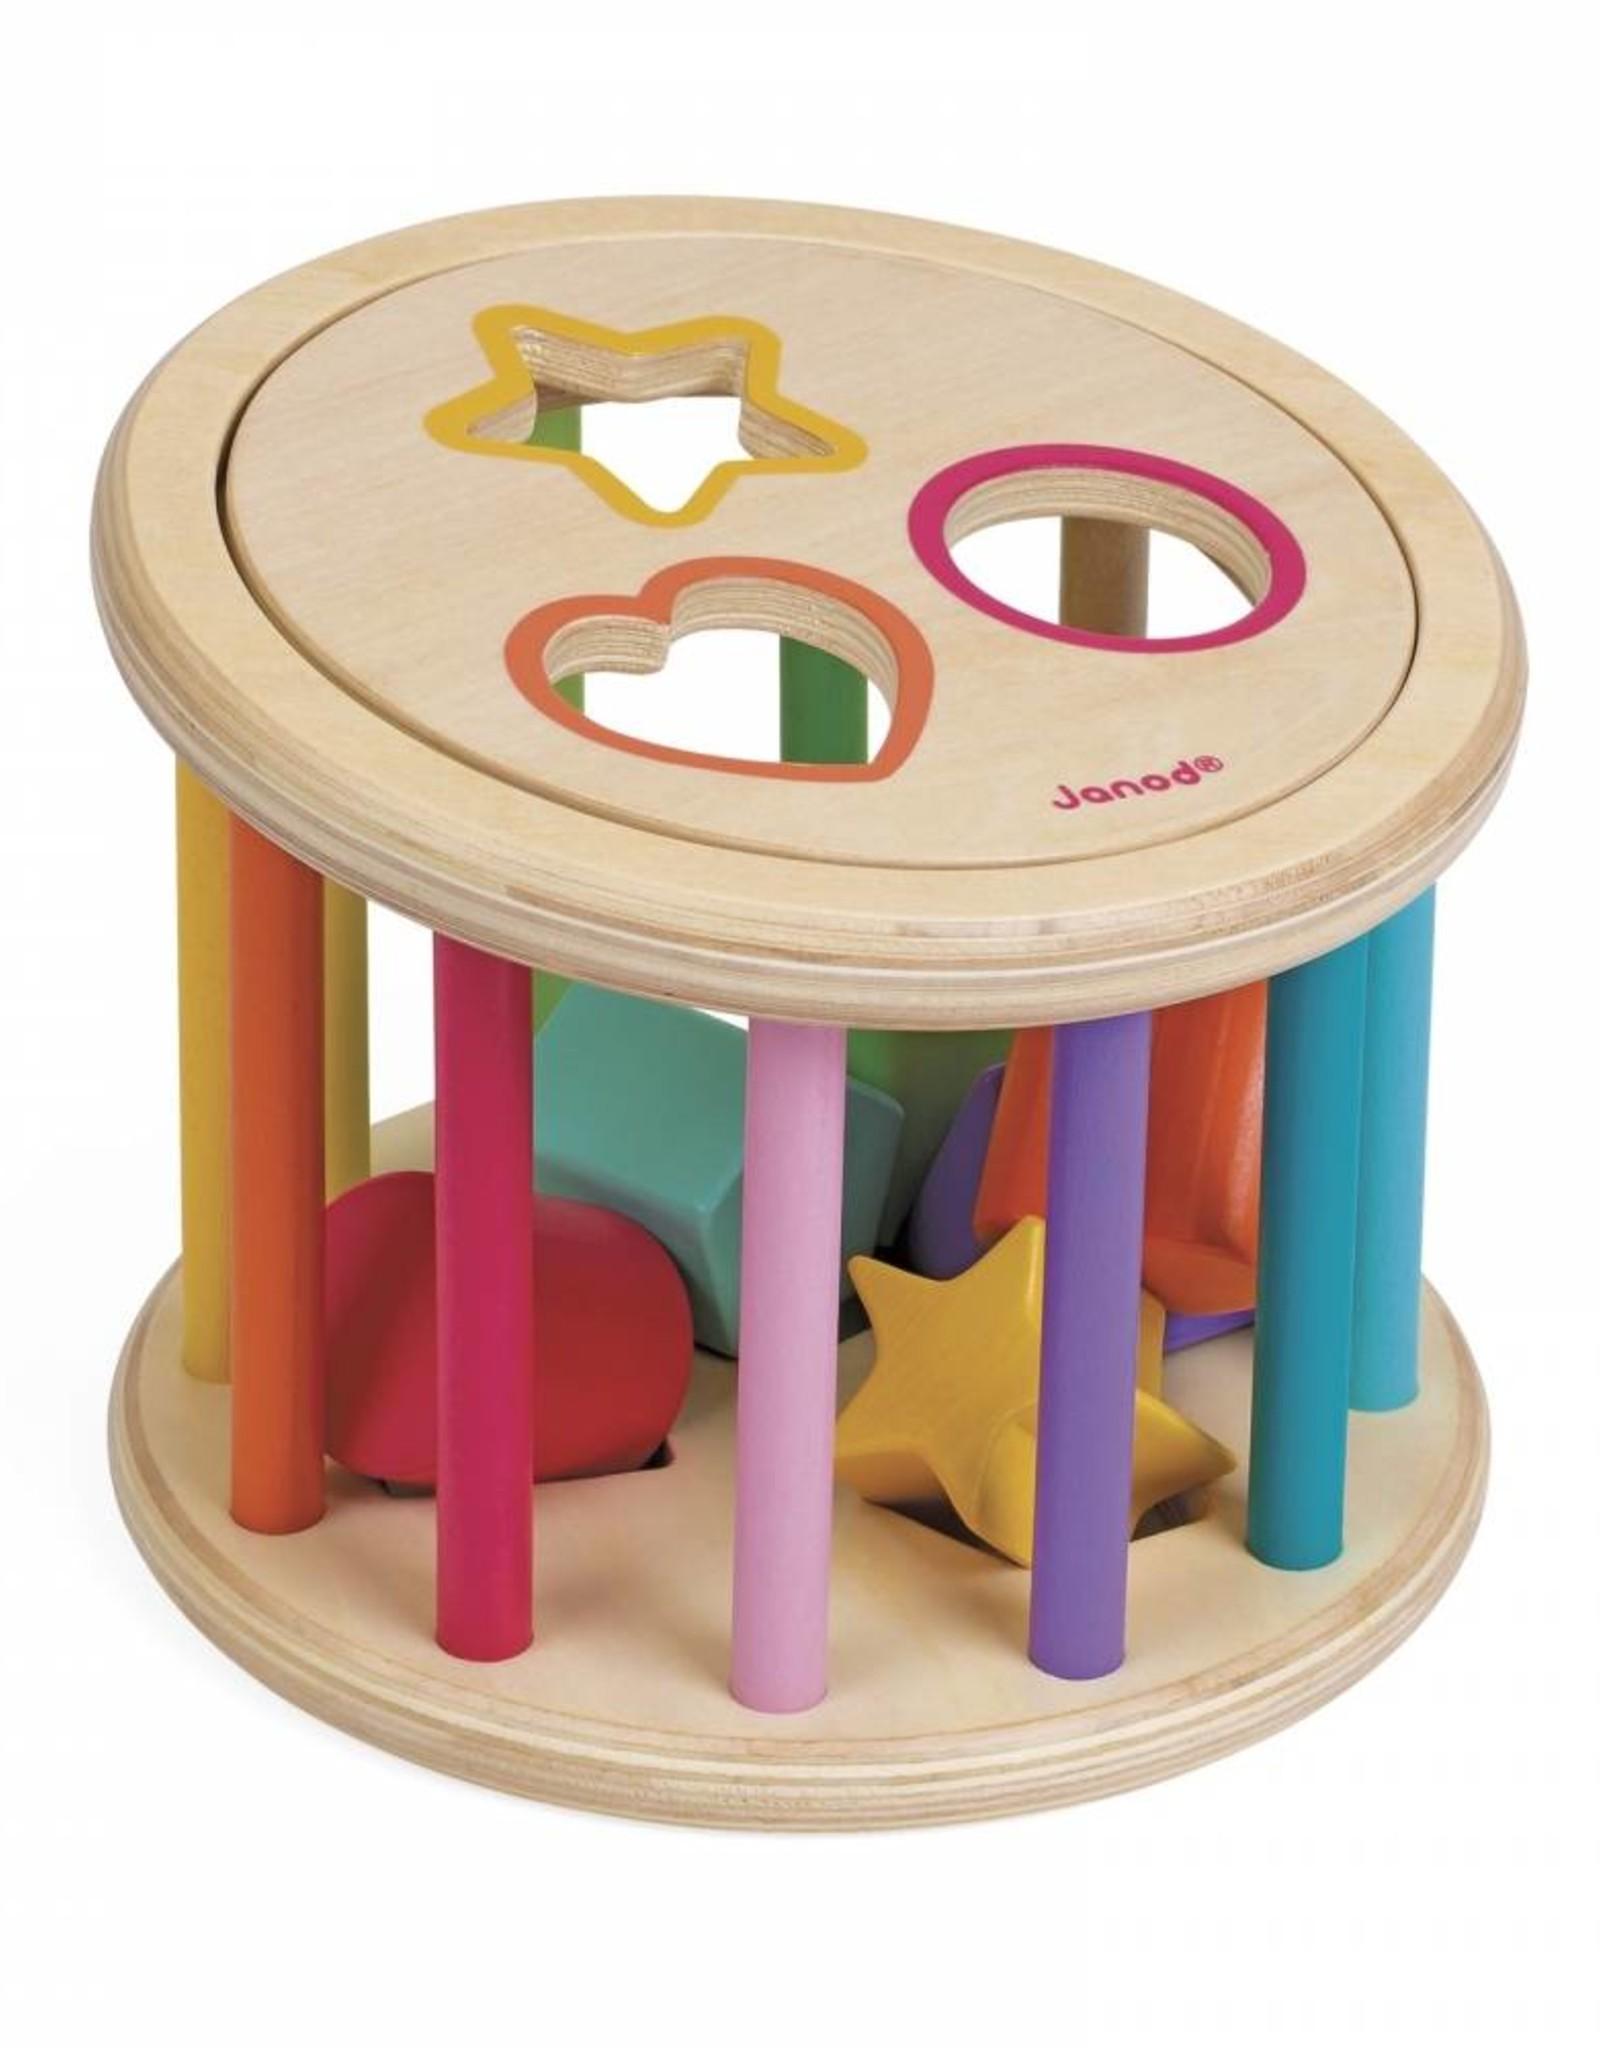 Janod shape sorter drum